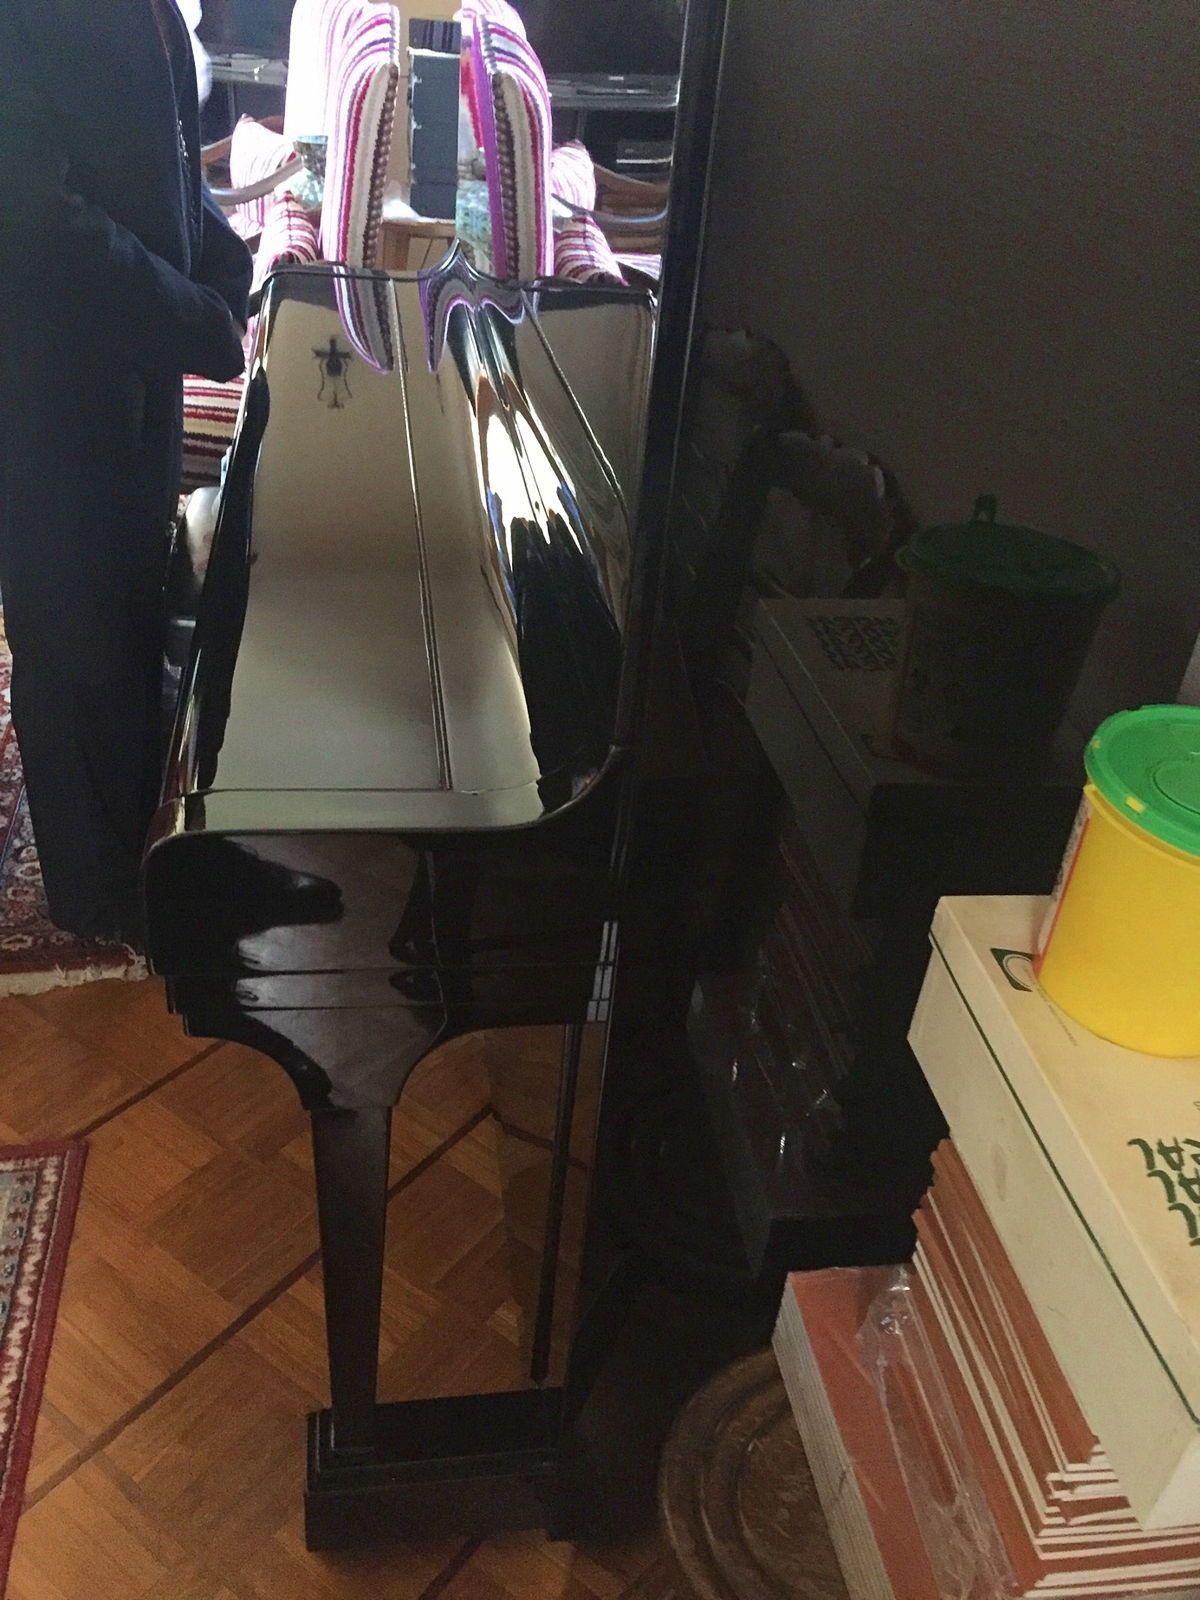 Piano Droit de concert A8BECHTEIN